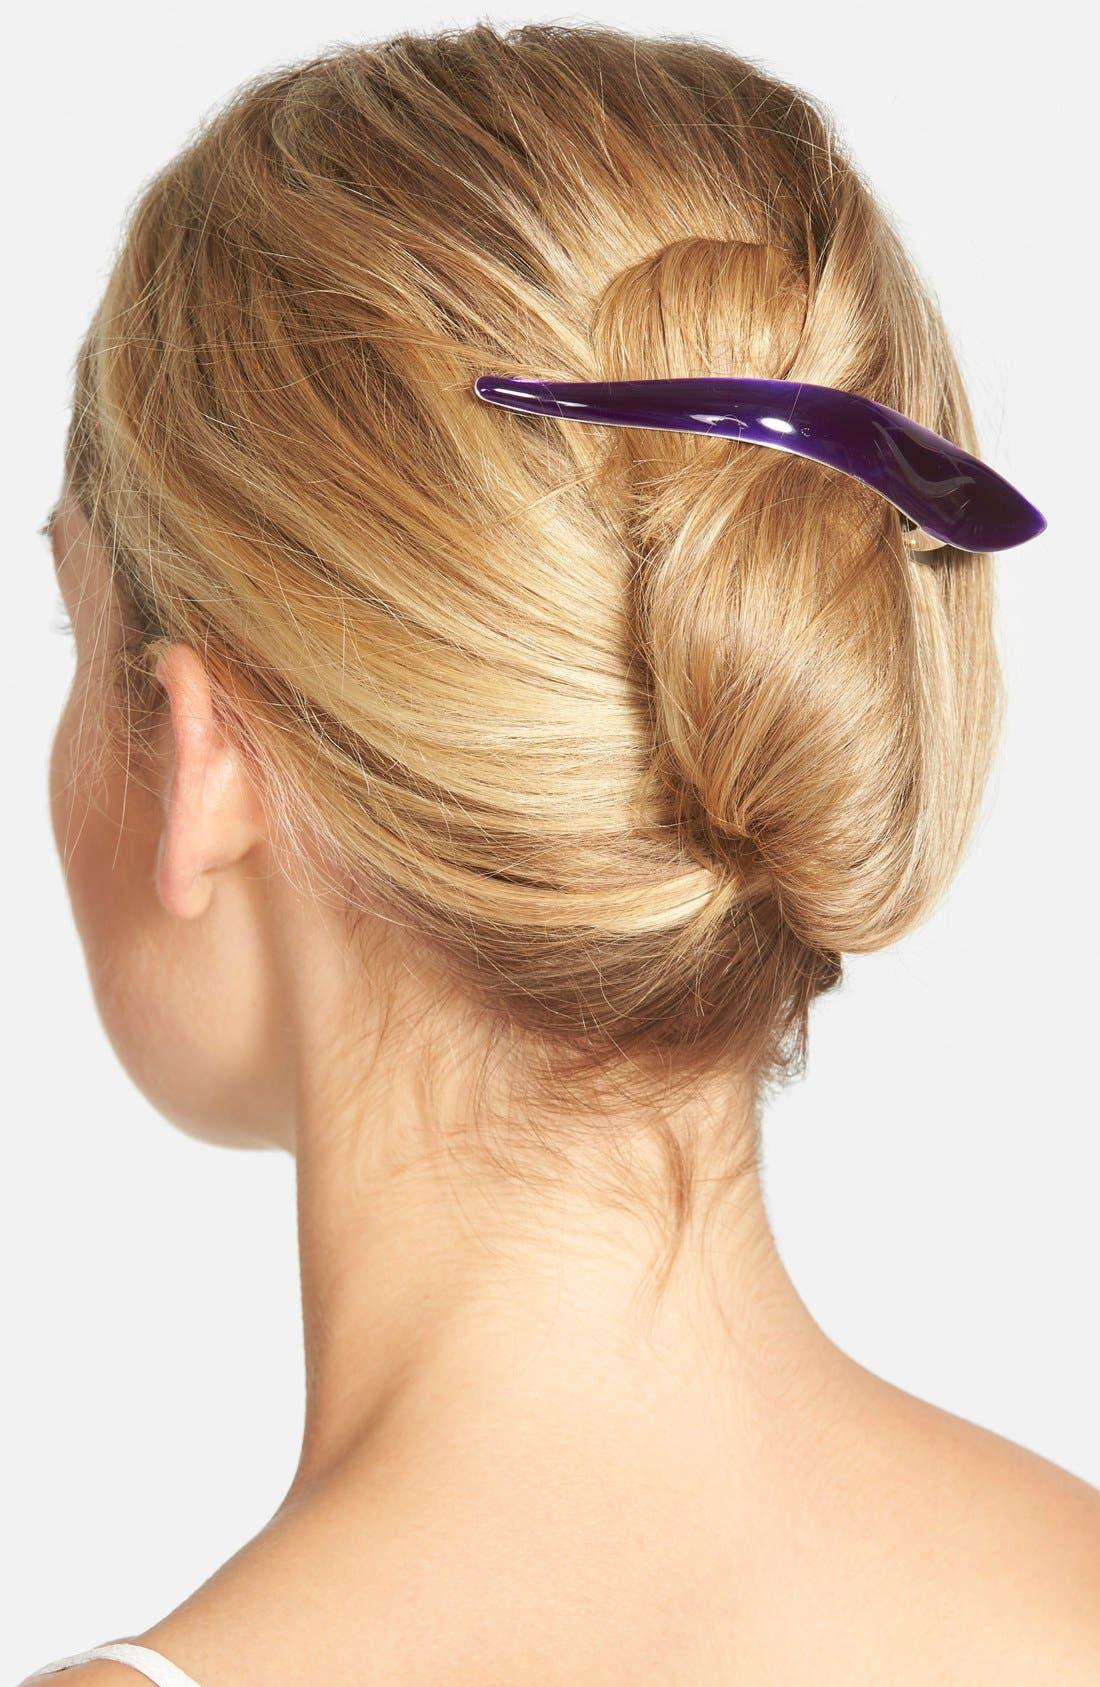 FICCARE 'Maximus' Hair Clip